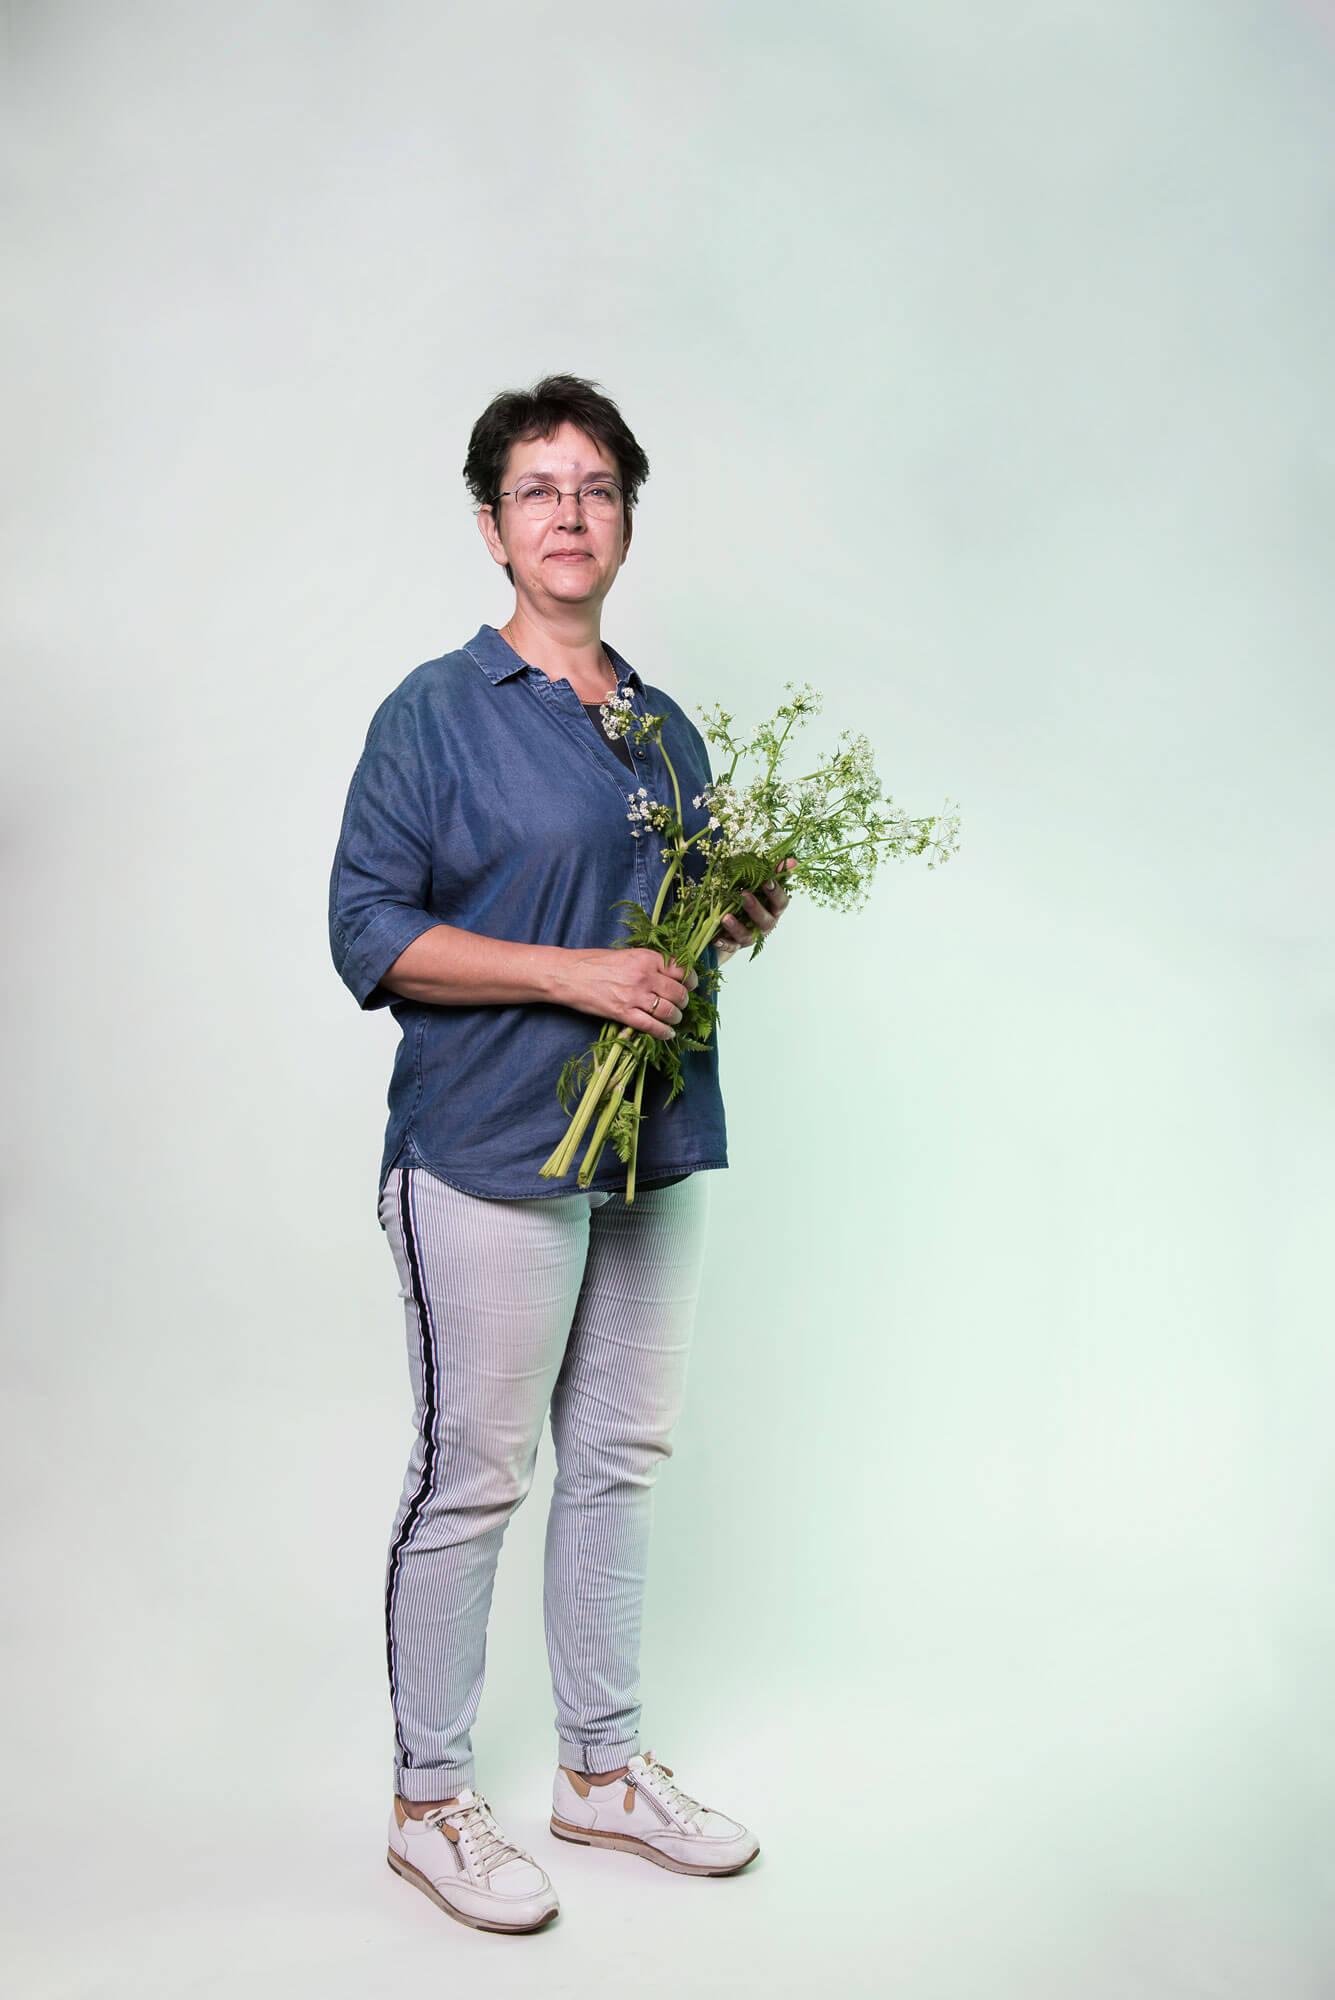 Tineke met bosje bloemen